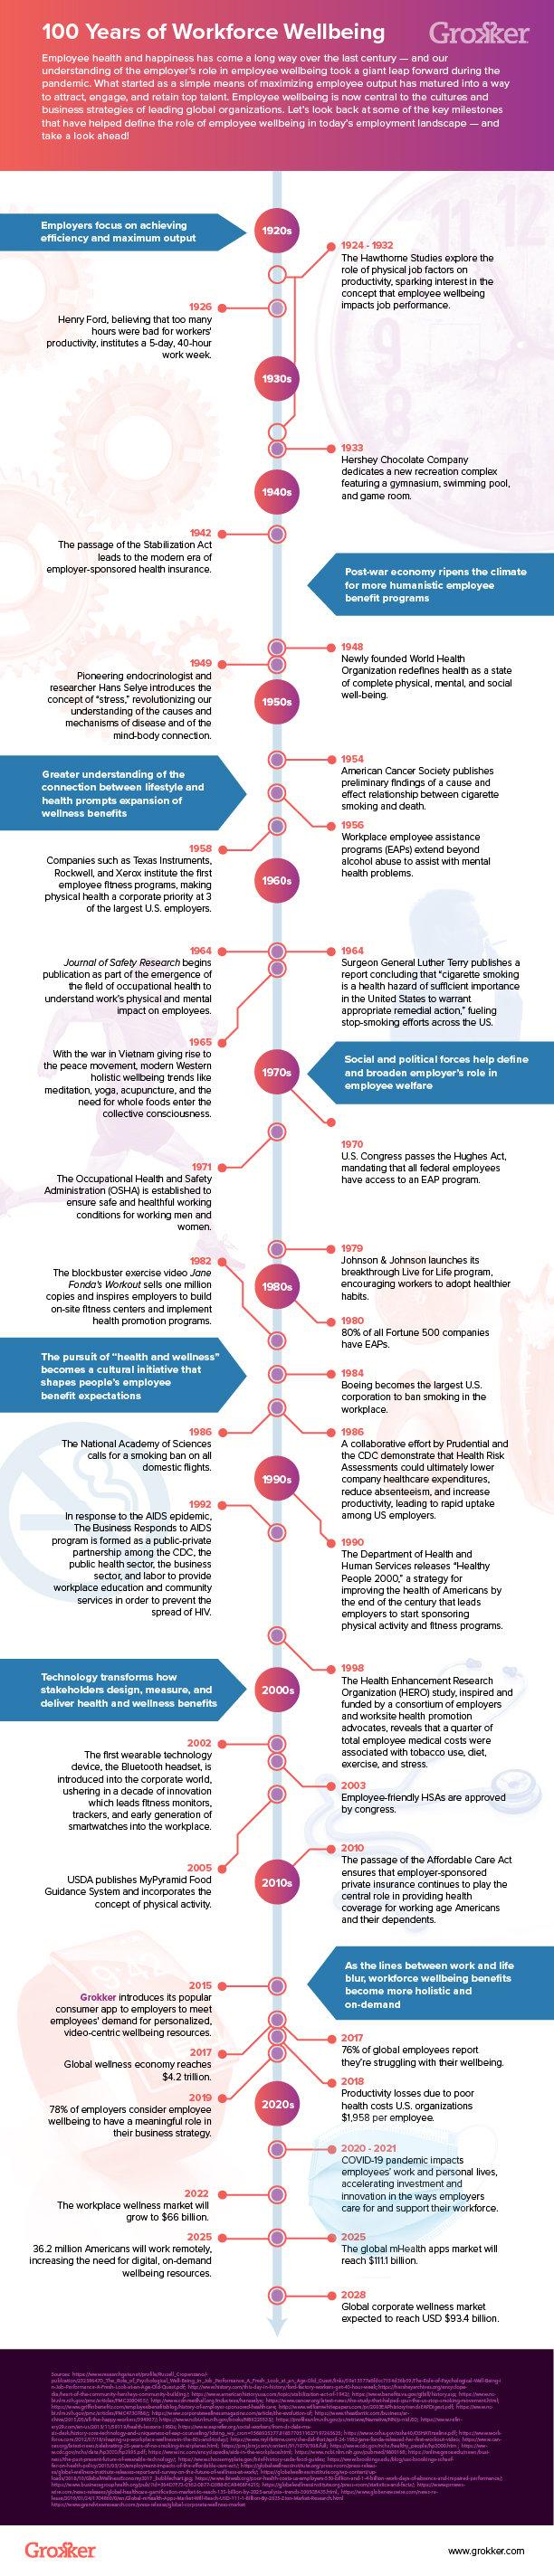 100 Years of Workforce Wellbeing Infographic Grokker1